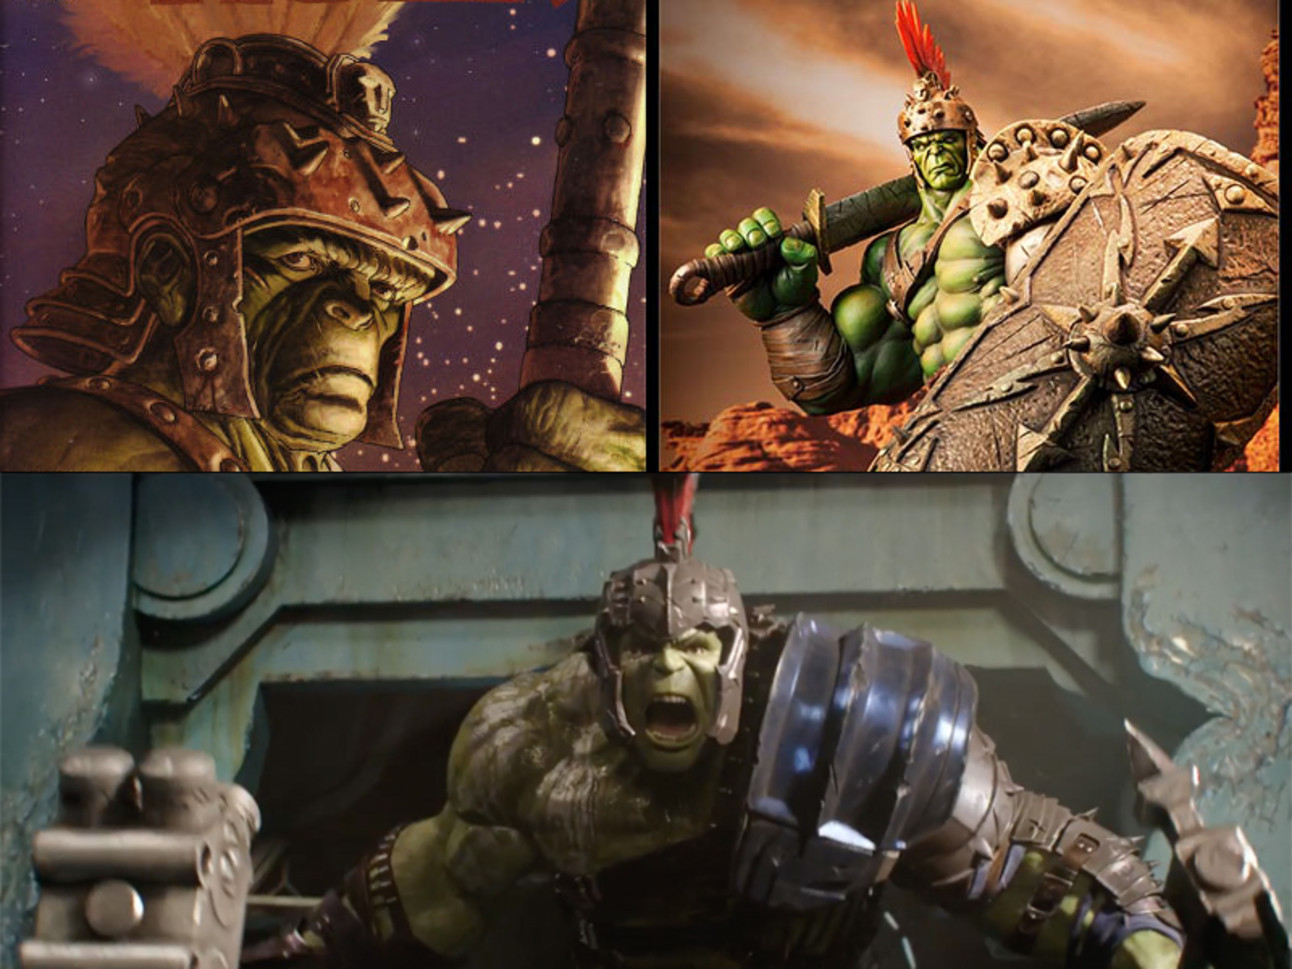 10-gladiator-hulk-comics-thor-ragnaraok.jpg